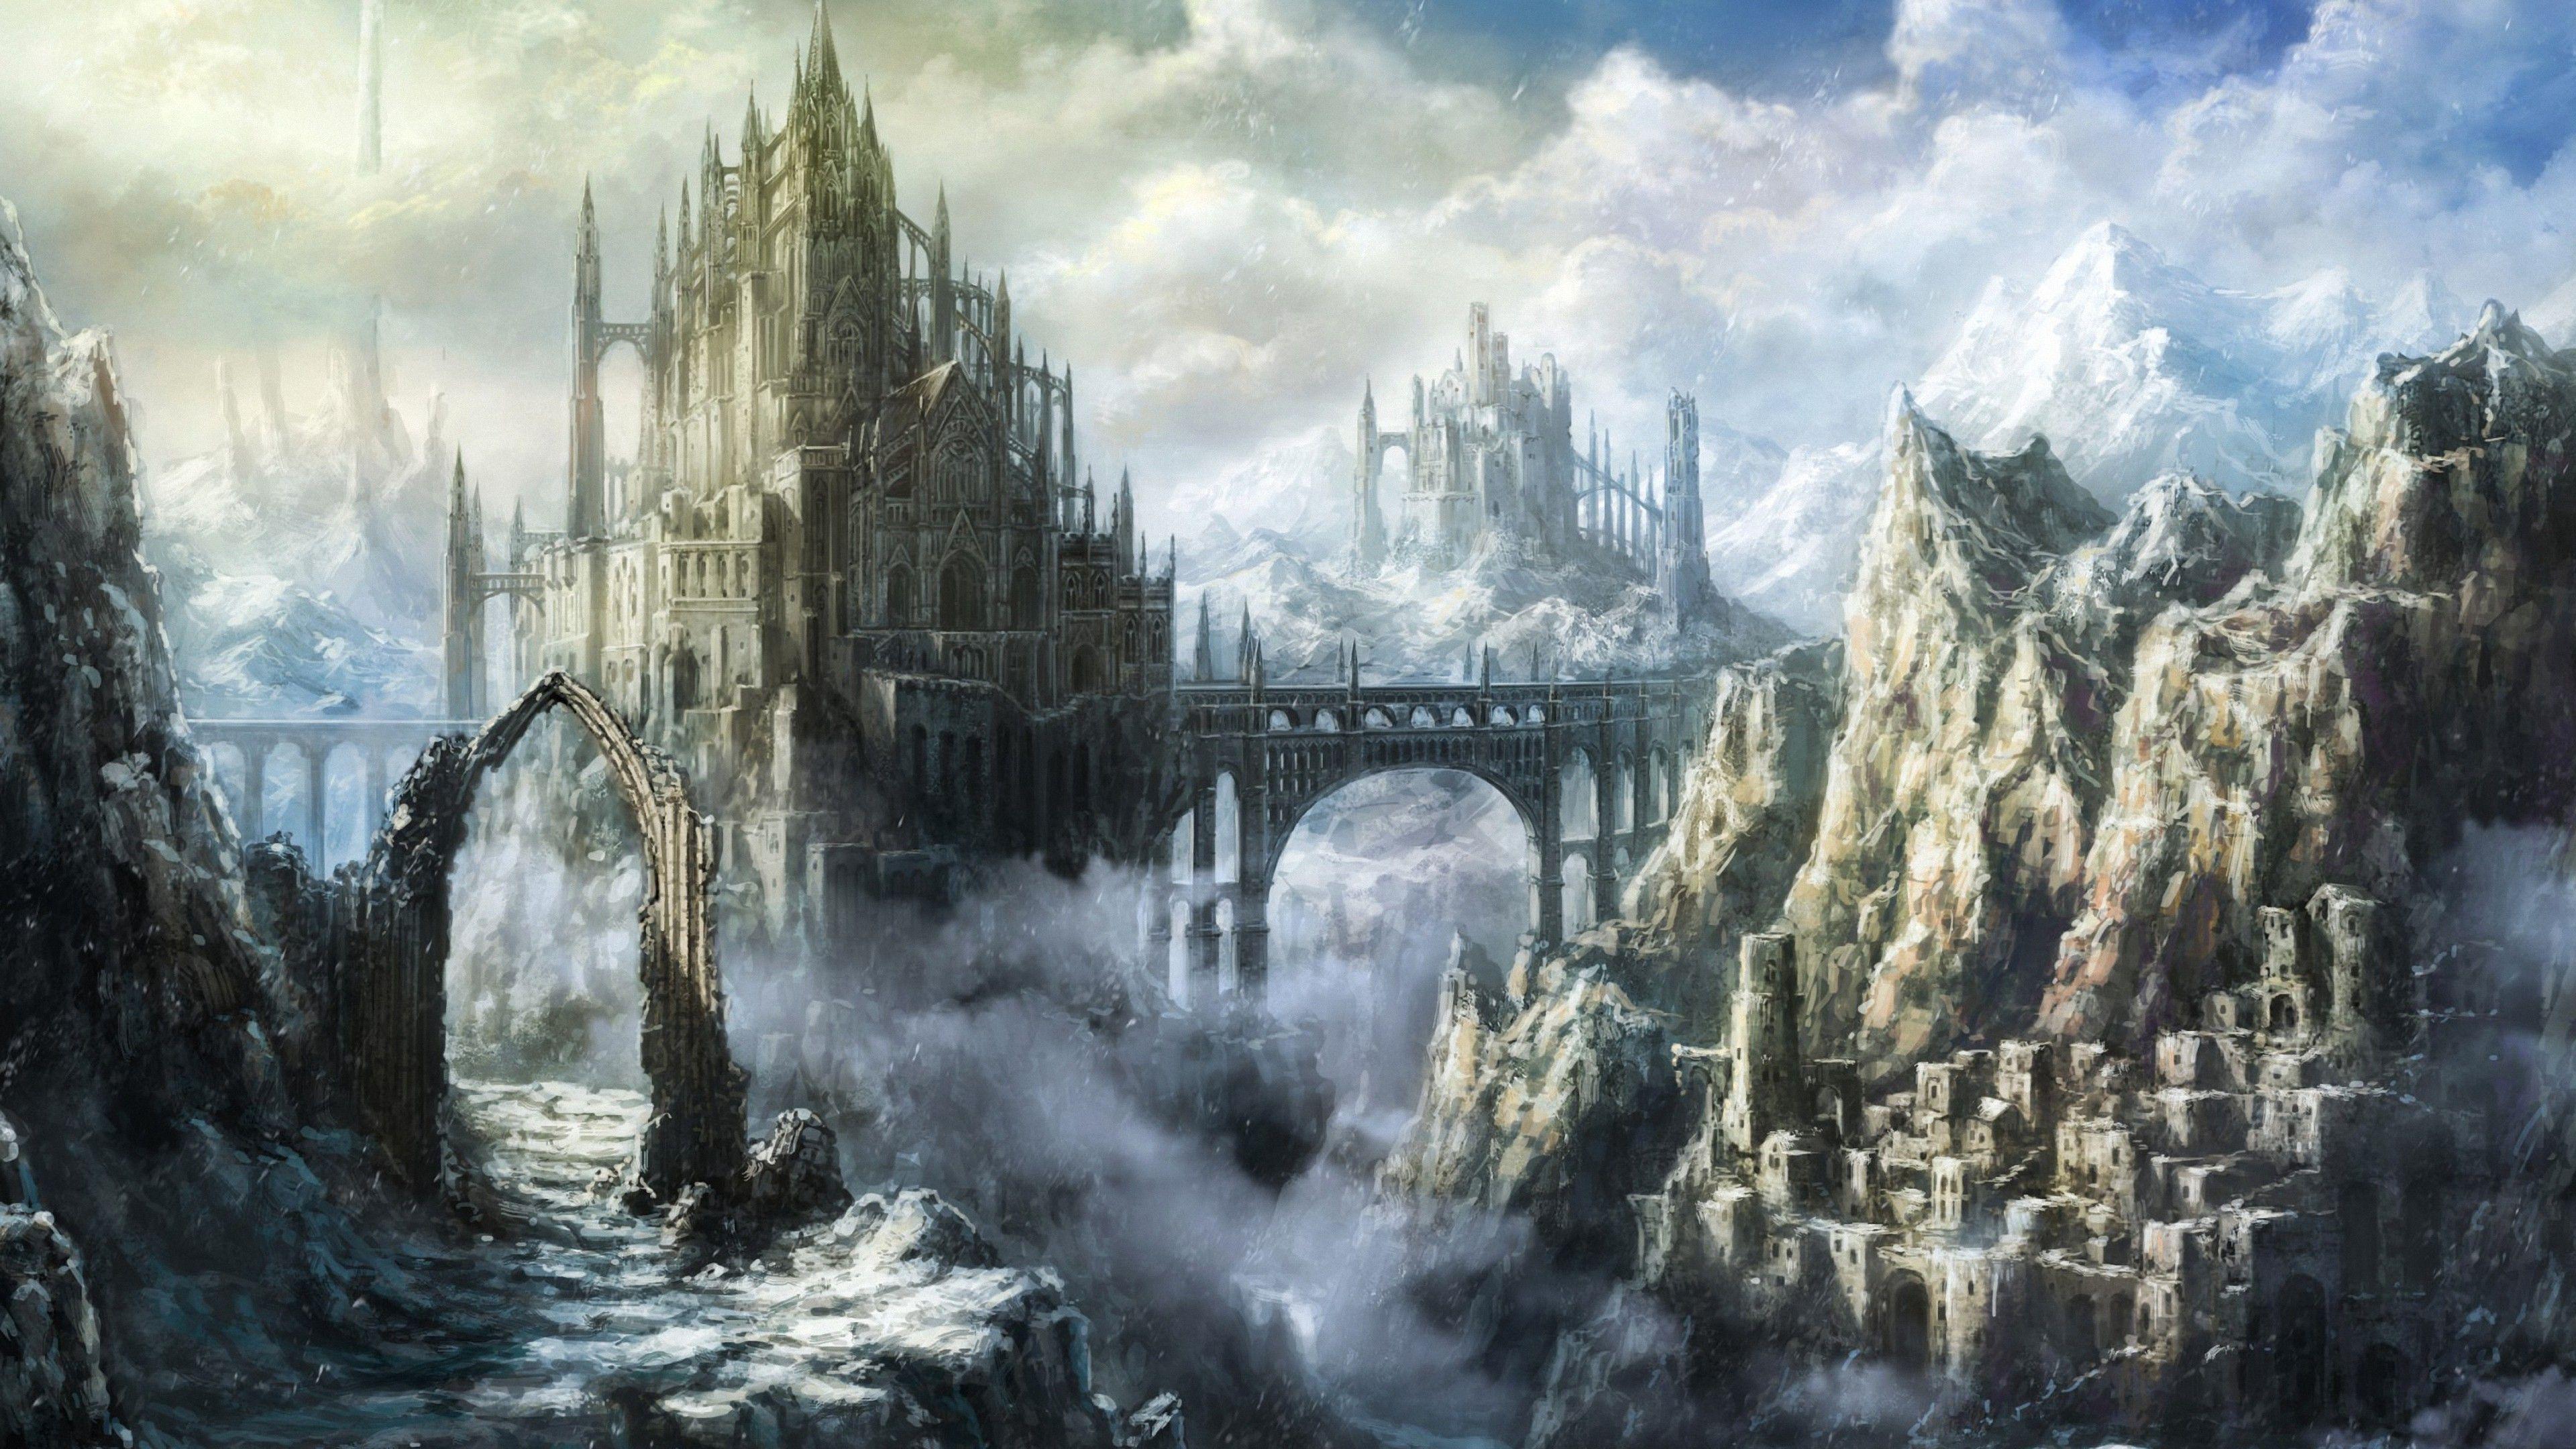 3840x2160 fantasy castle fortress 4k Ultra HD wallpapers